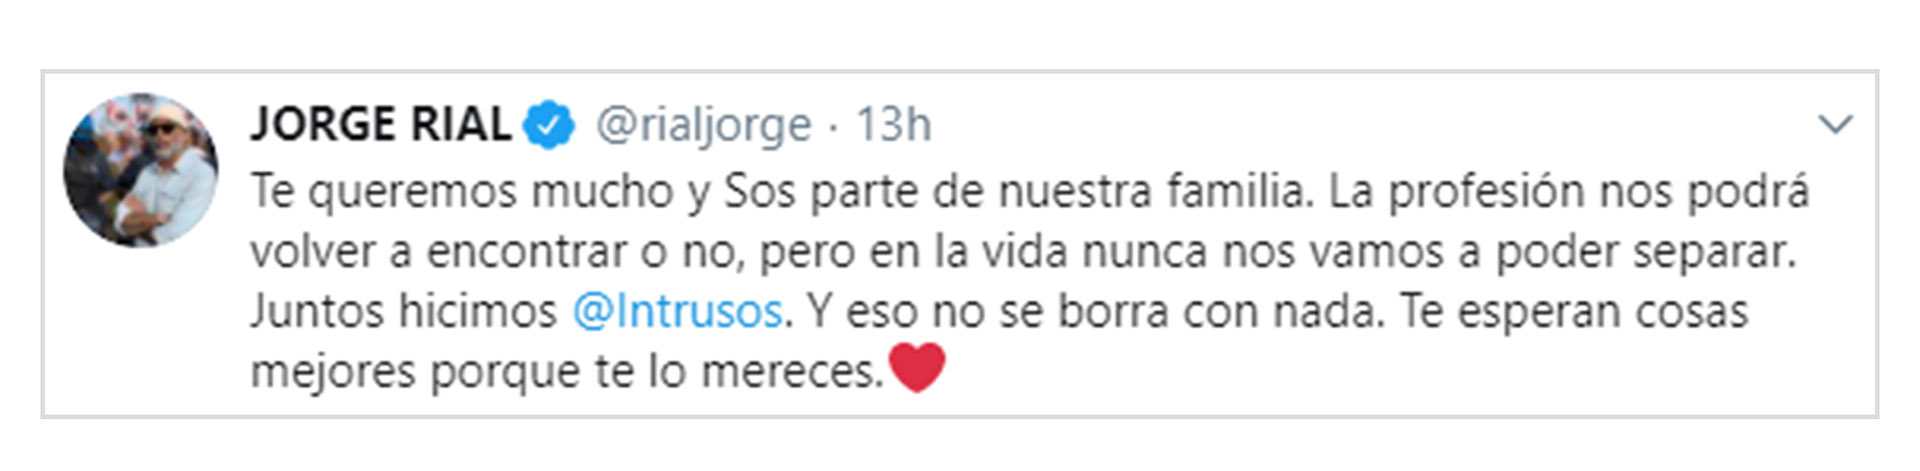 El mensaje de Jorge Rial para Daniel Ambrosino (Twitter)